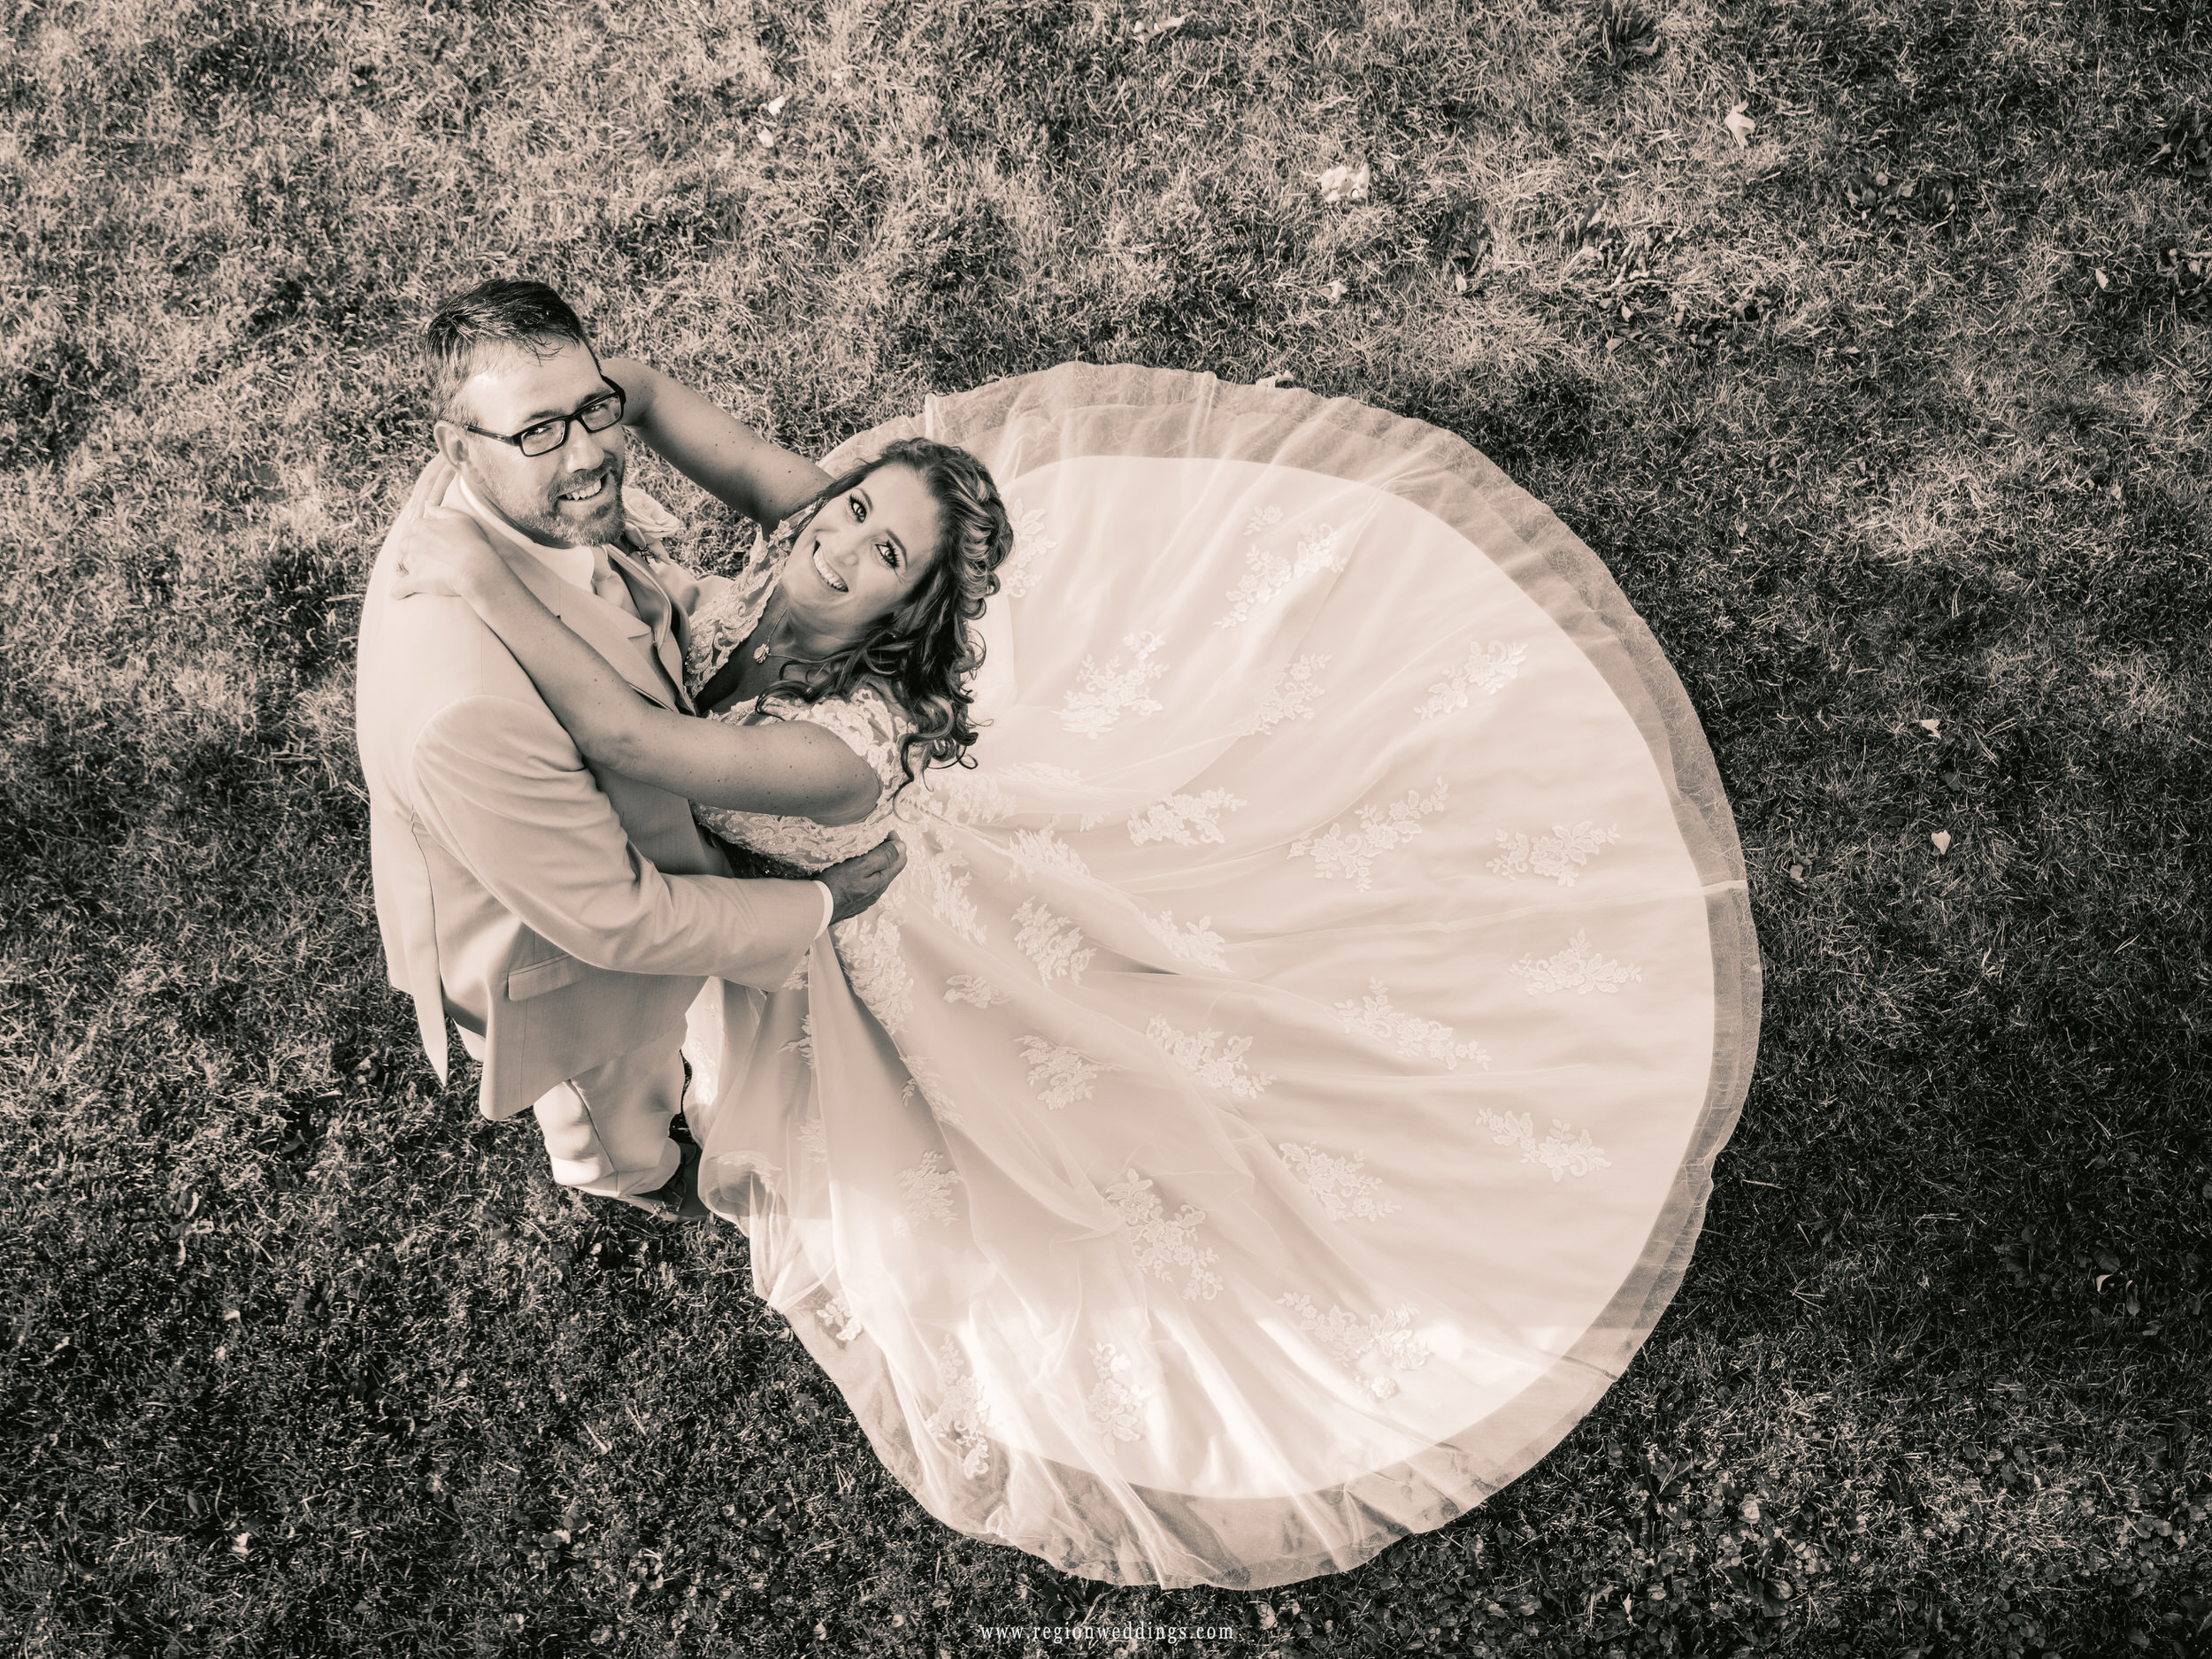 Vintage looking wedding photo of the bride and groom.